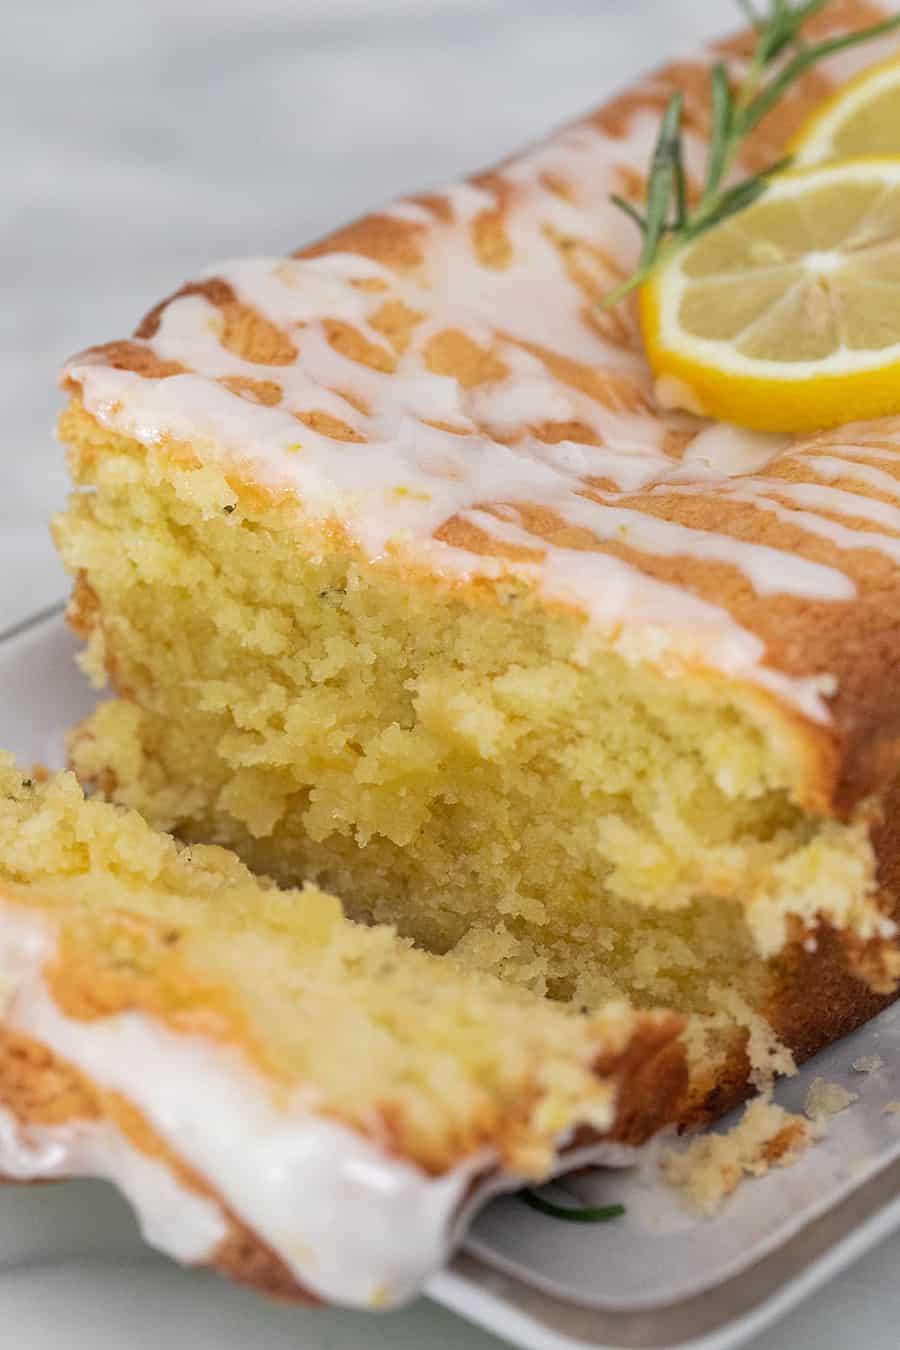 Super moist lemon loaf cake with glaze